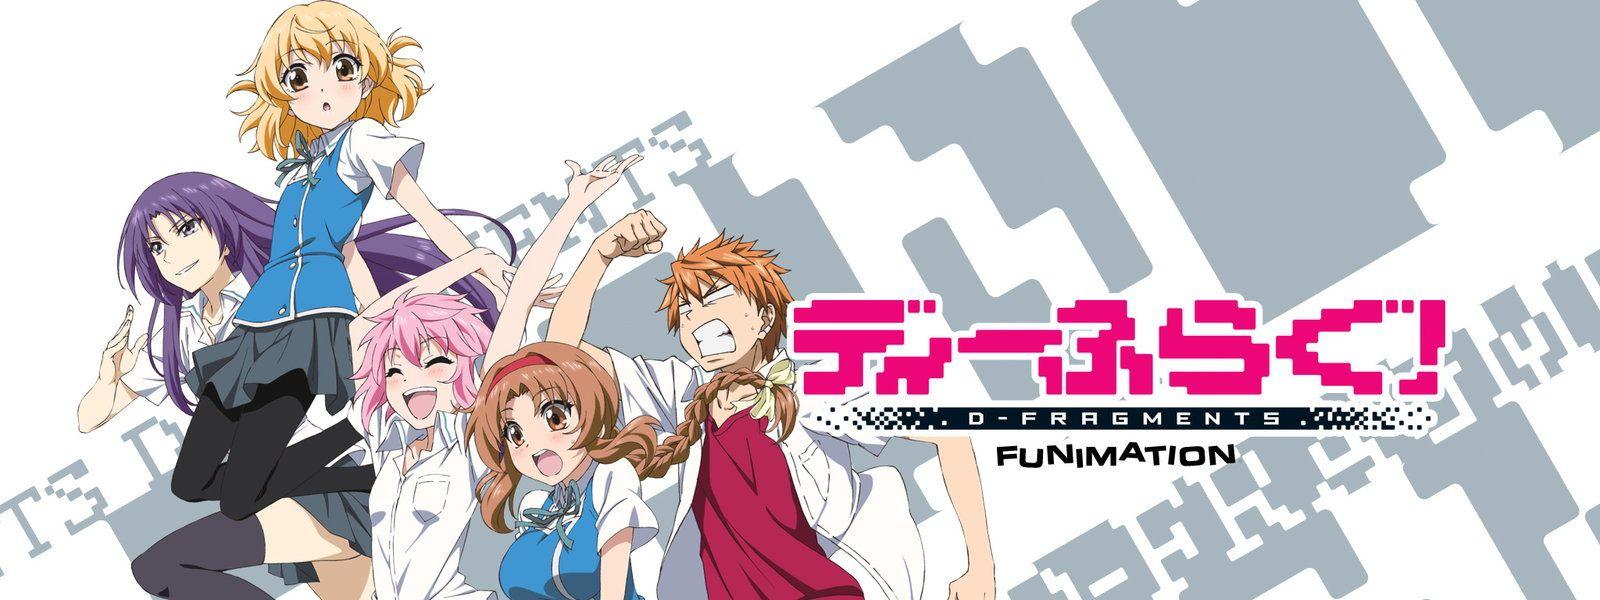 DFragments Anime english dubbed, Anime watch, Anime